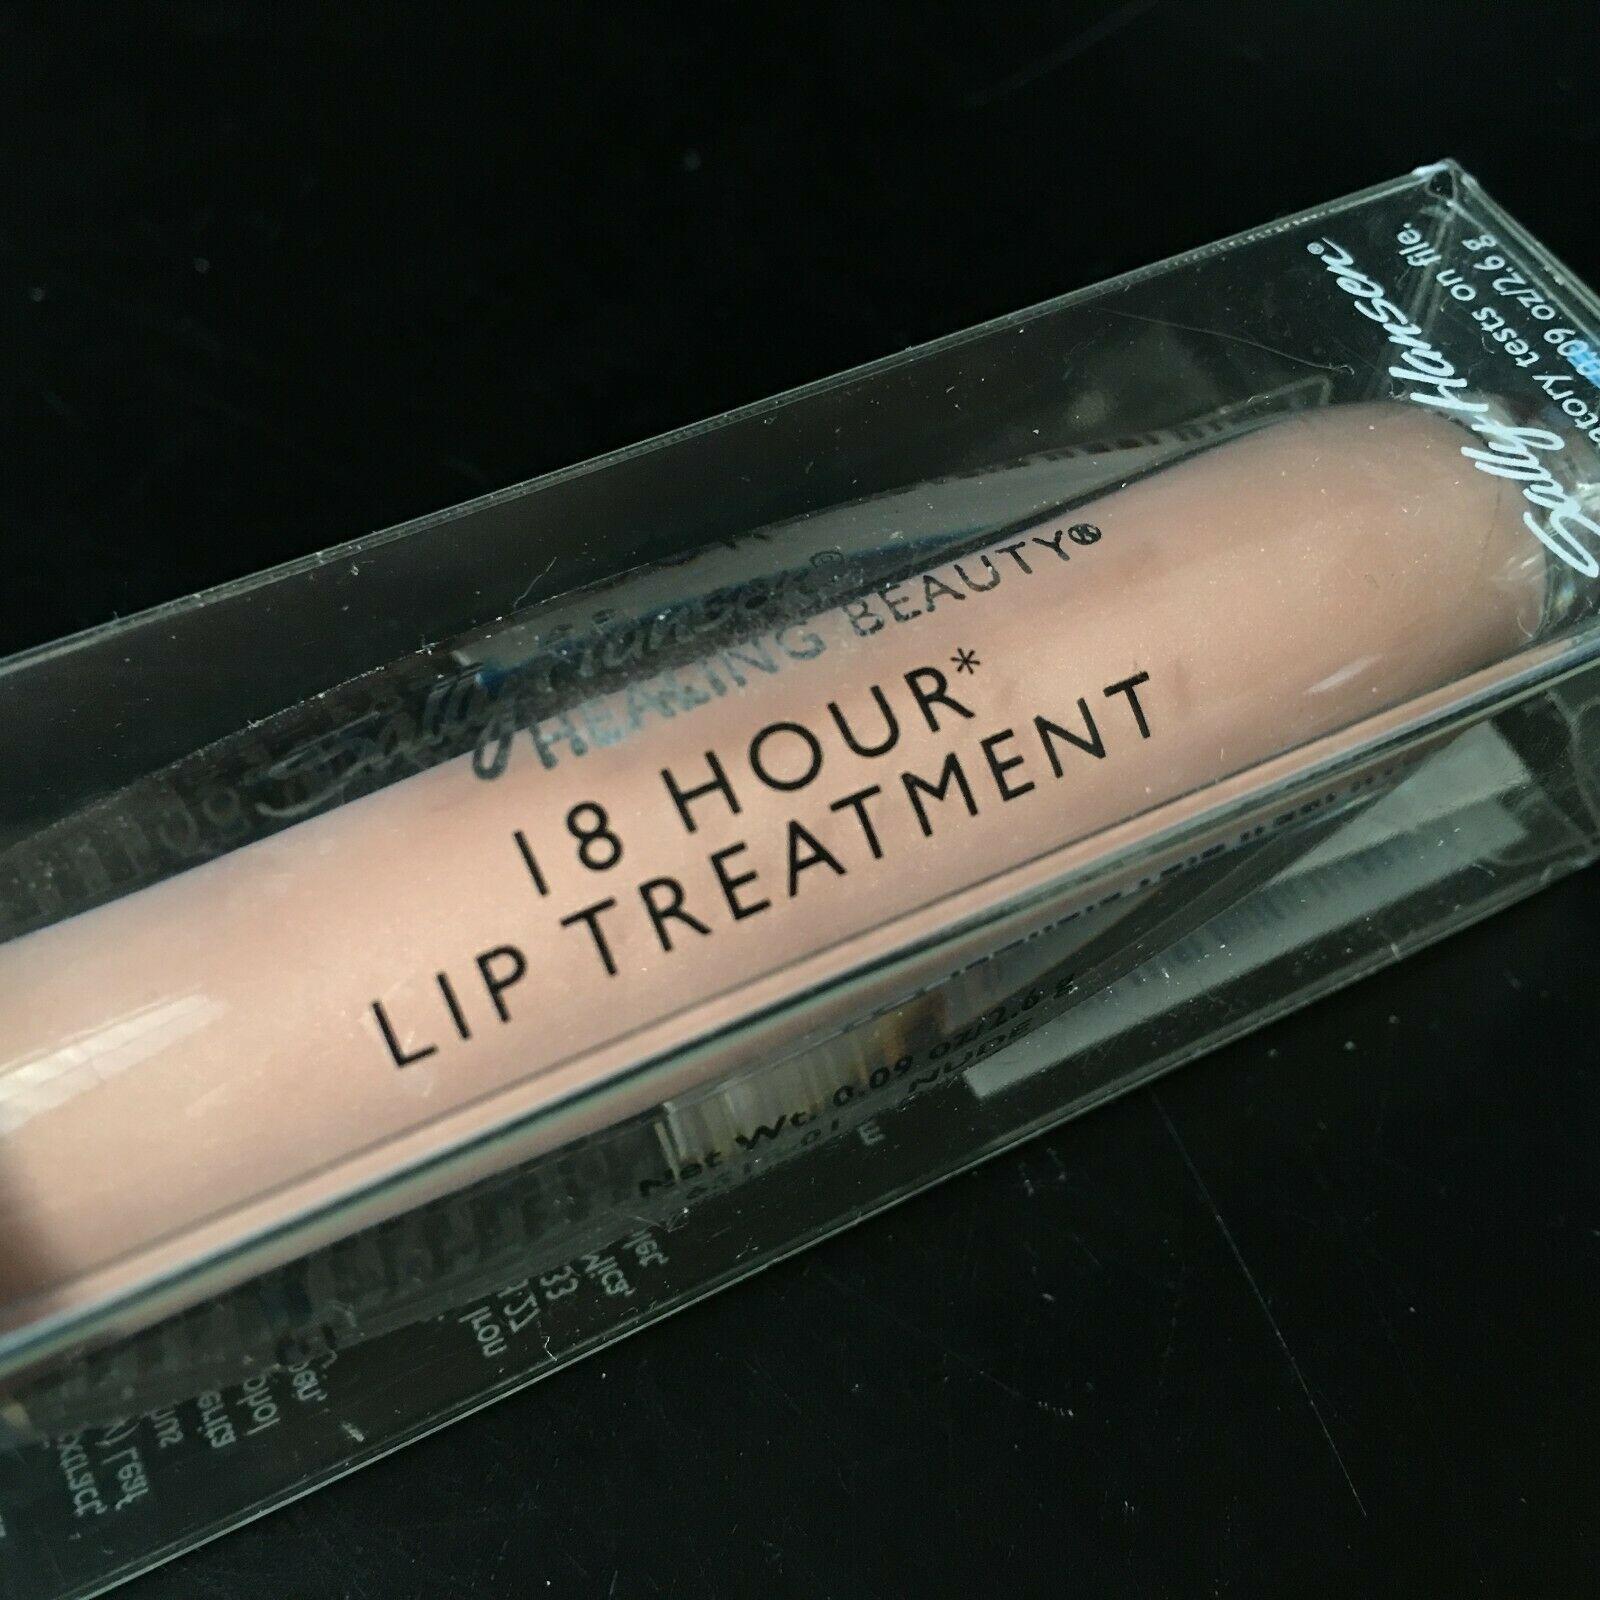 SALLY HANSEN* Tube 18 HOUR LIP TREATMENT Gloss CLEAR NUDE Color #6518-01 Boxed